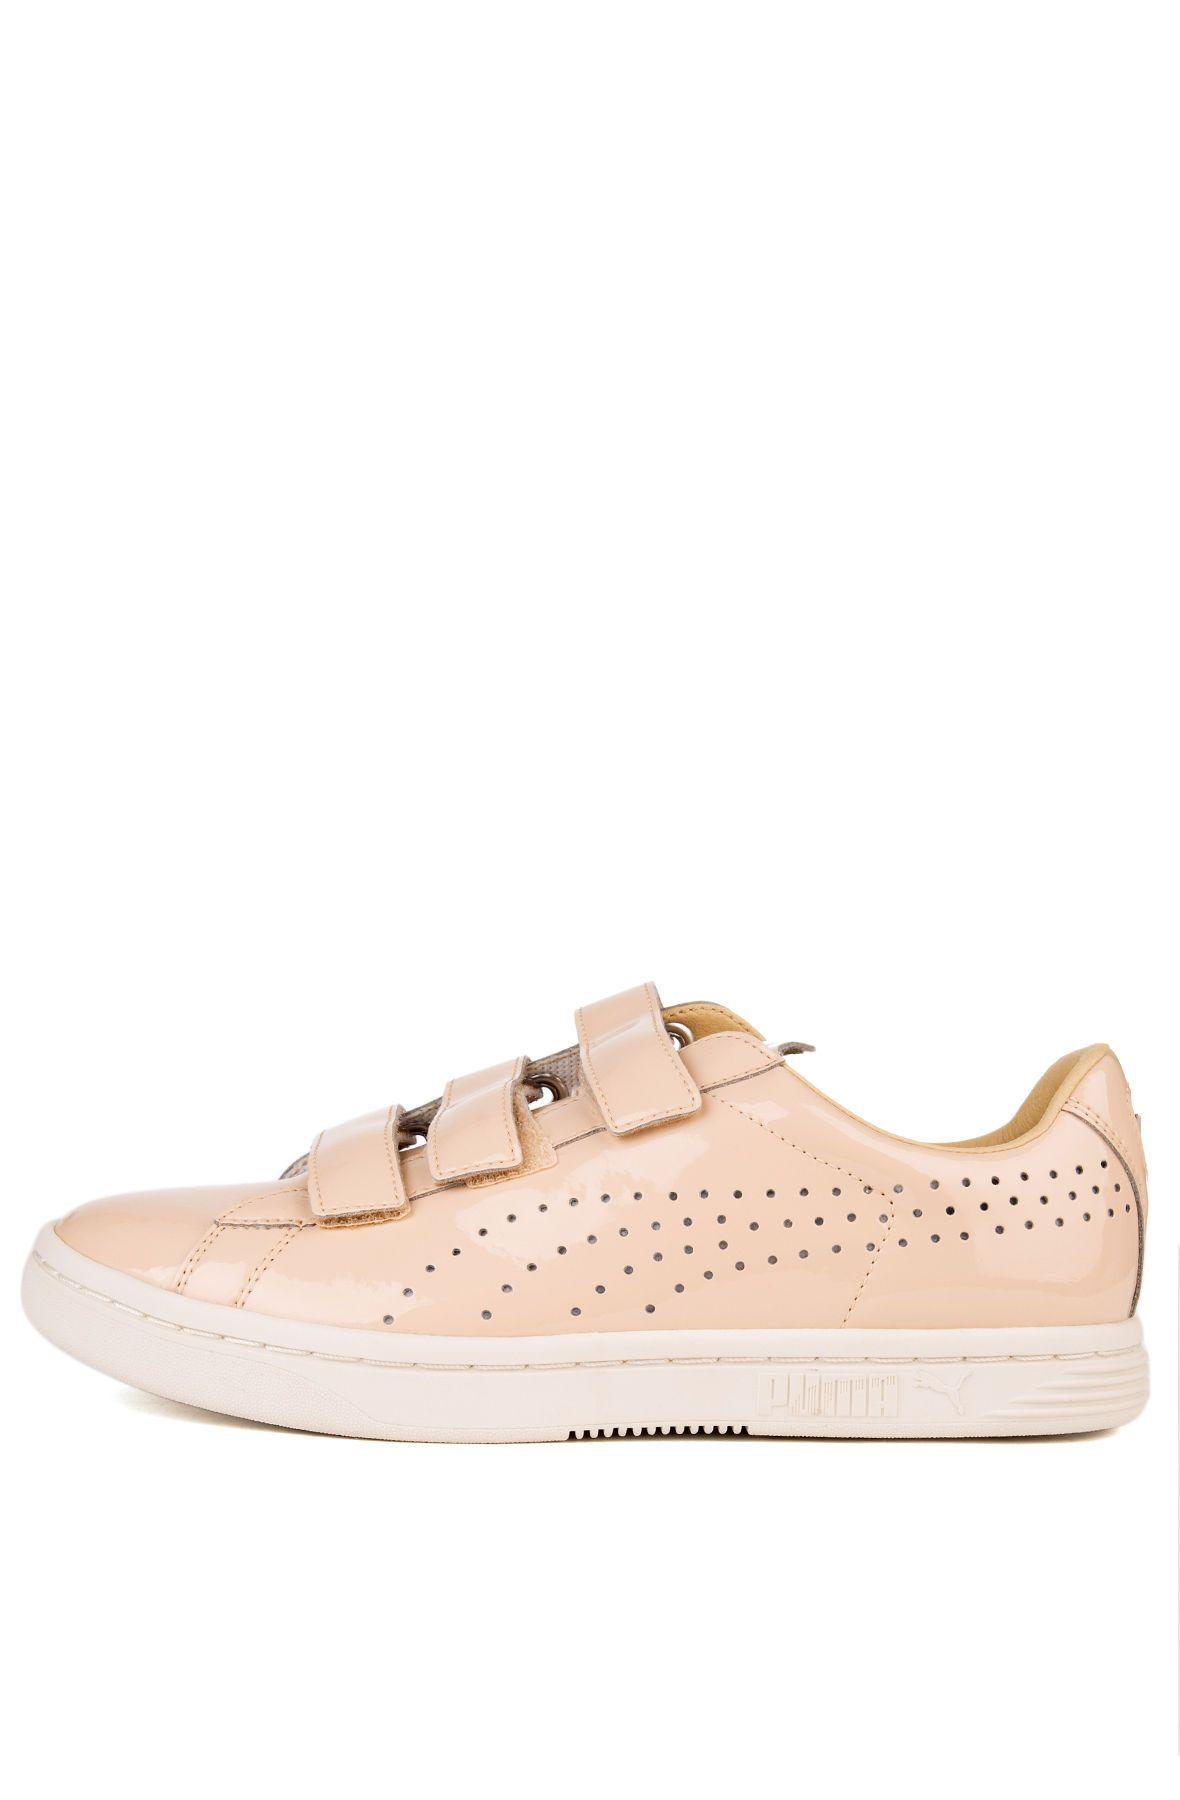 The Court Star Velcro Nude Sneaker in Natural Vachetta and Whisper White